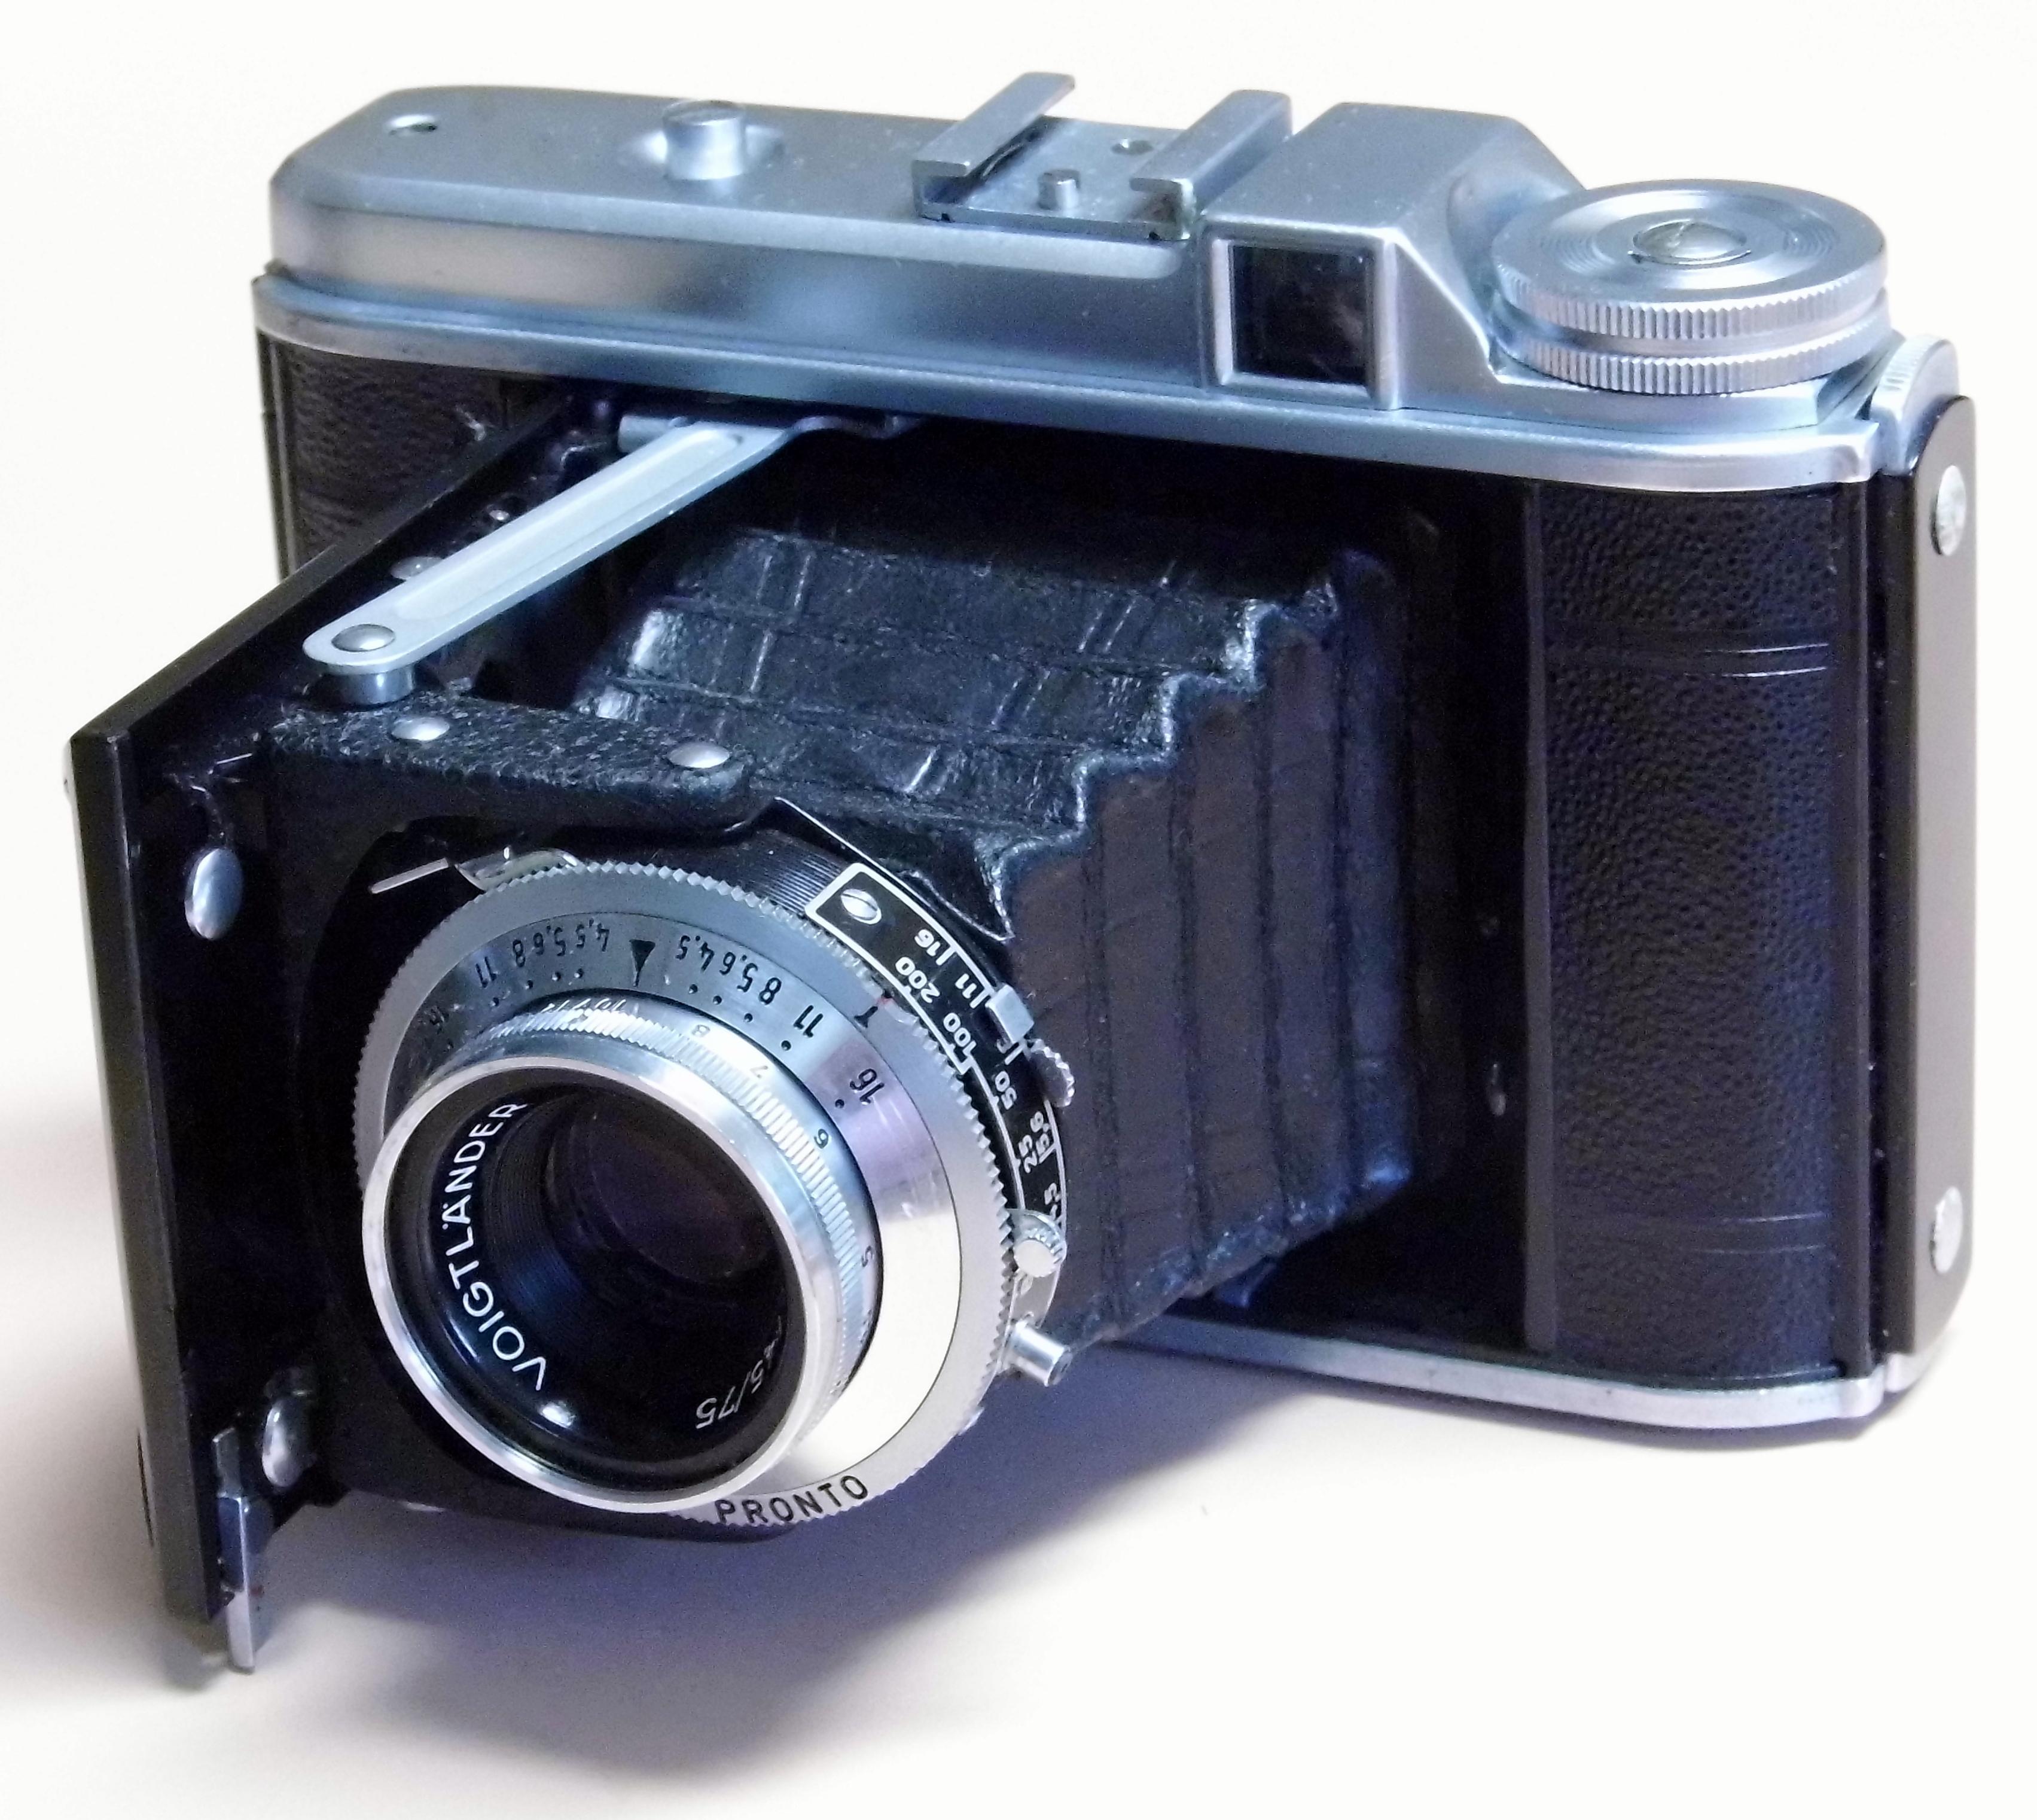 Fichier:Vintage Voigtlander Perkeo I 6x6 Folding Camera ... Pictures Made With Voigtlander